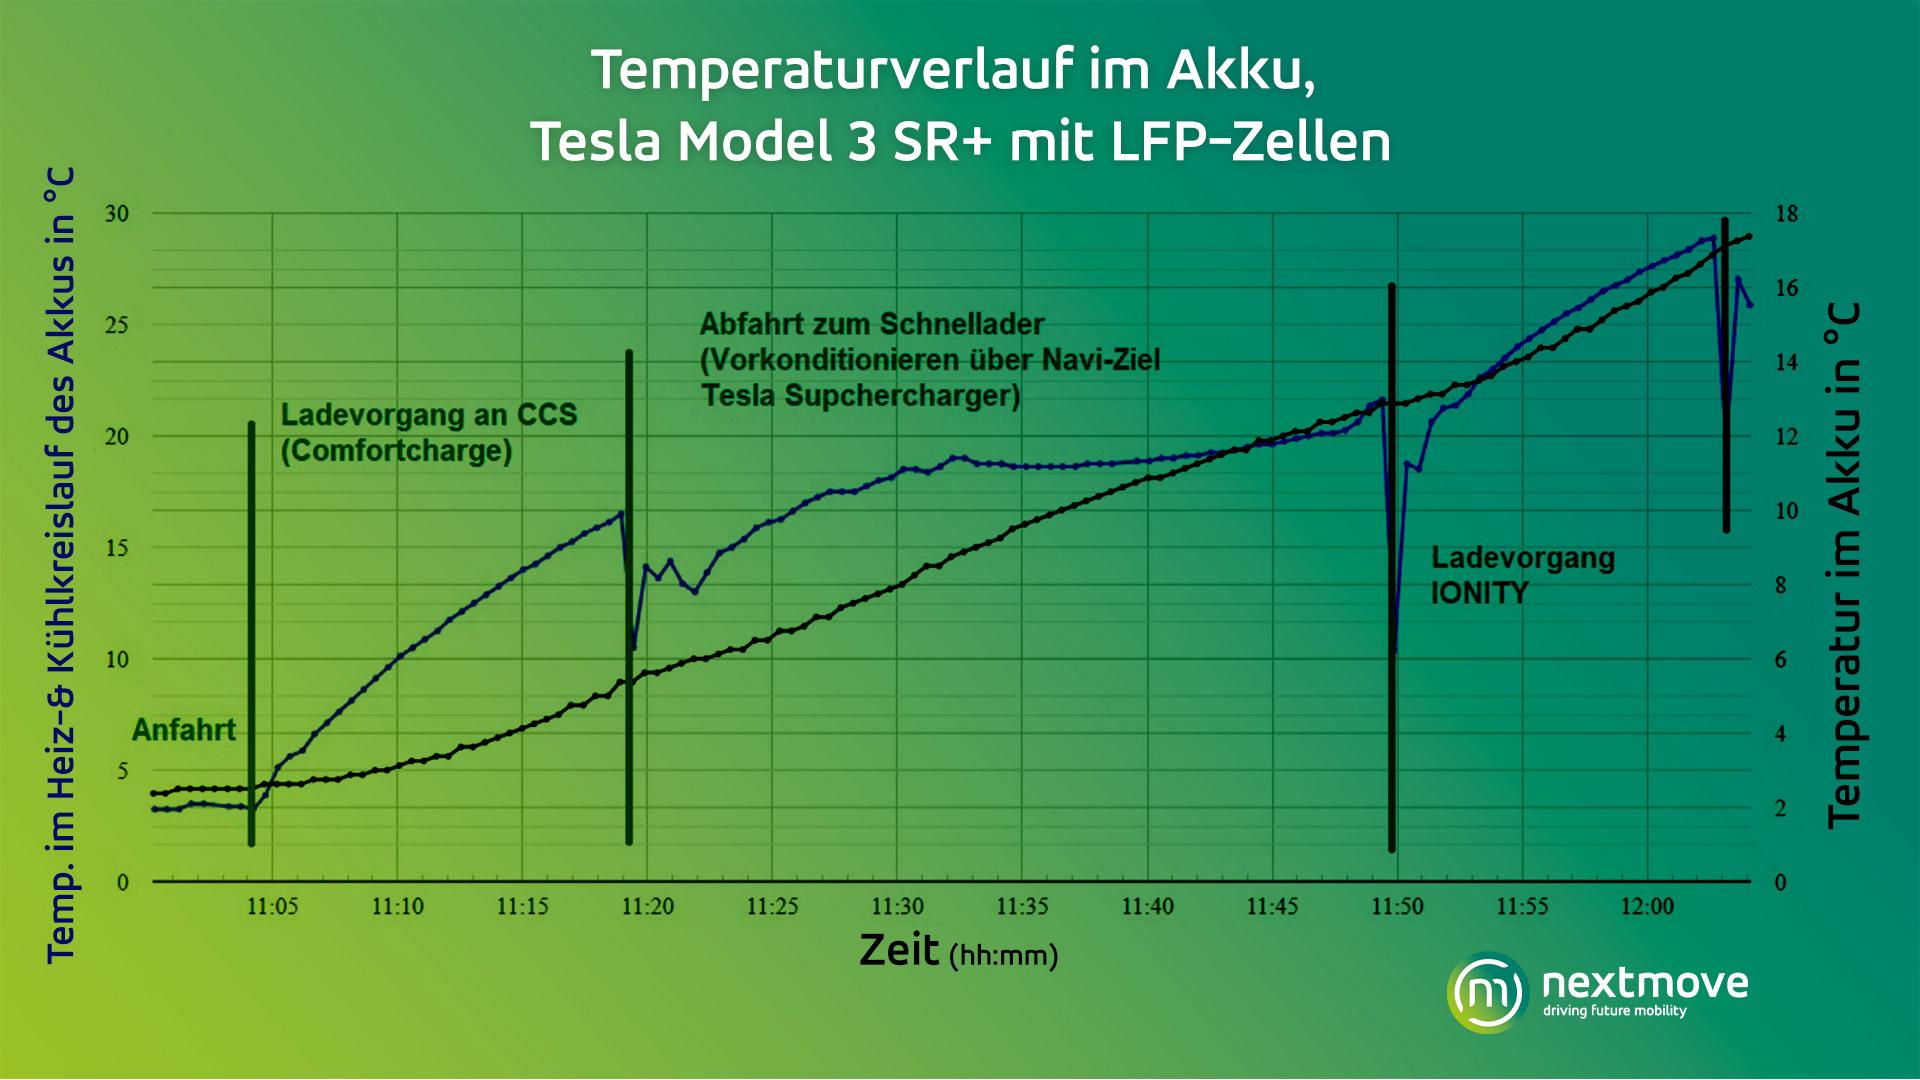 nextmove Grafik Temperaturverlauf im Akku Model 3 SR+ LFP-Zellen